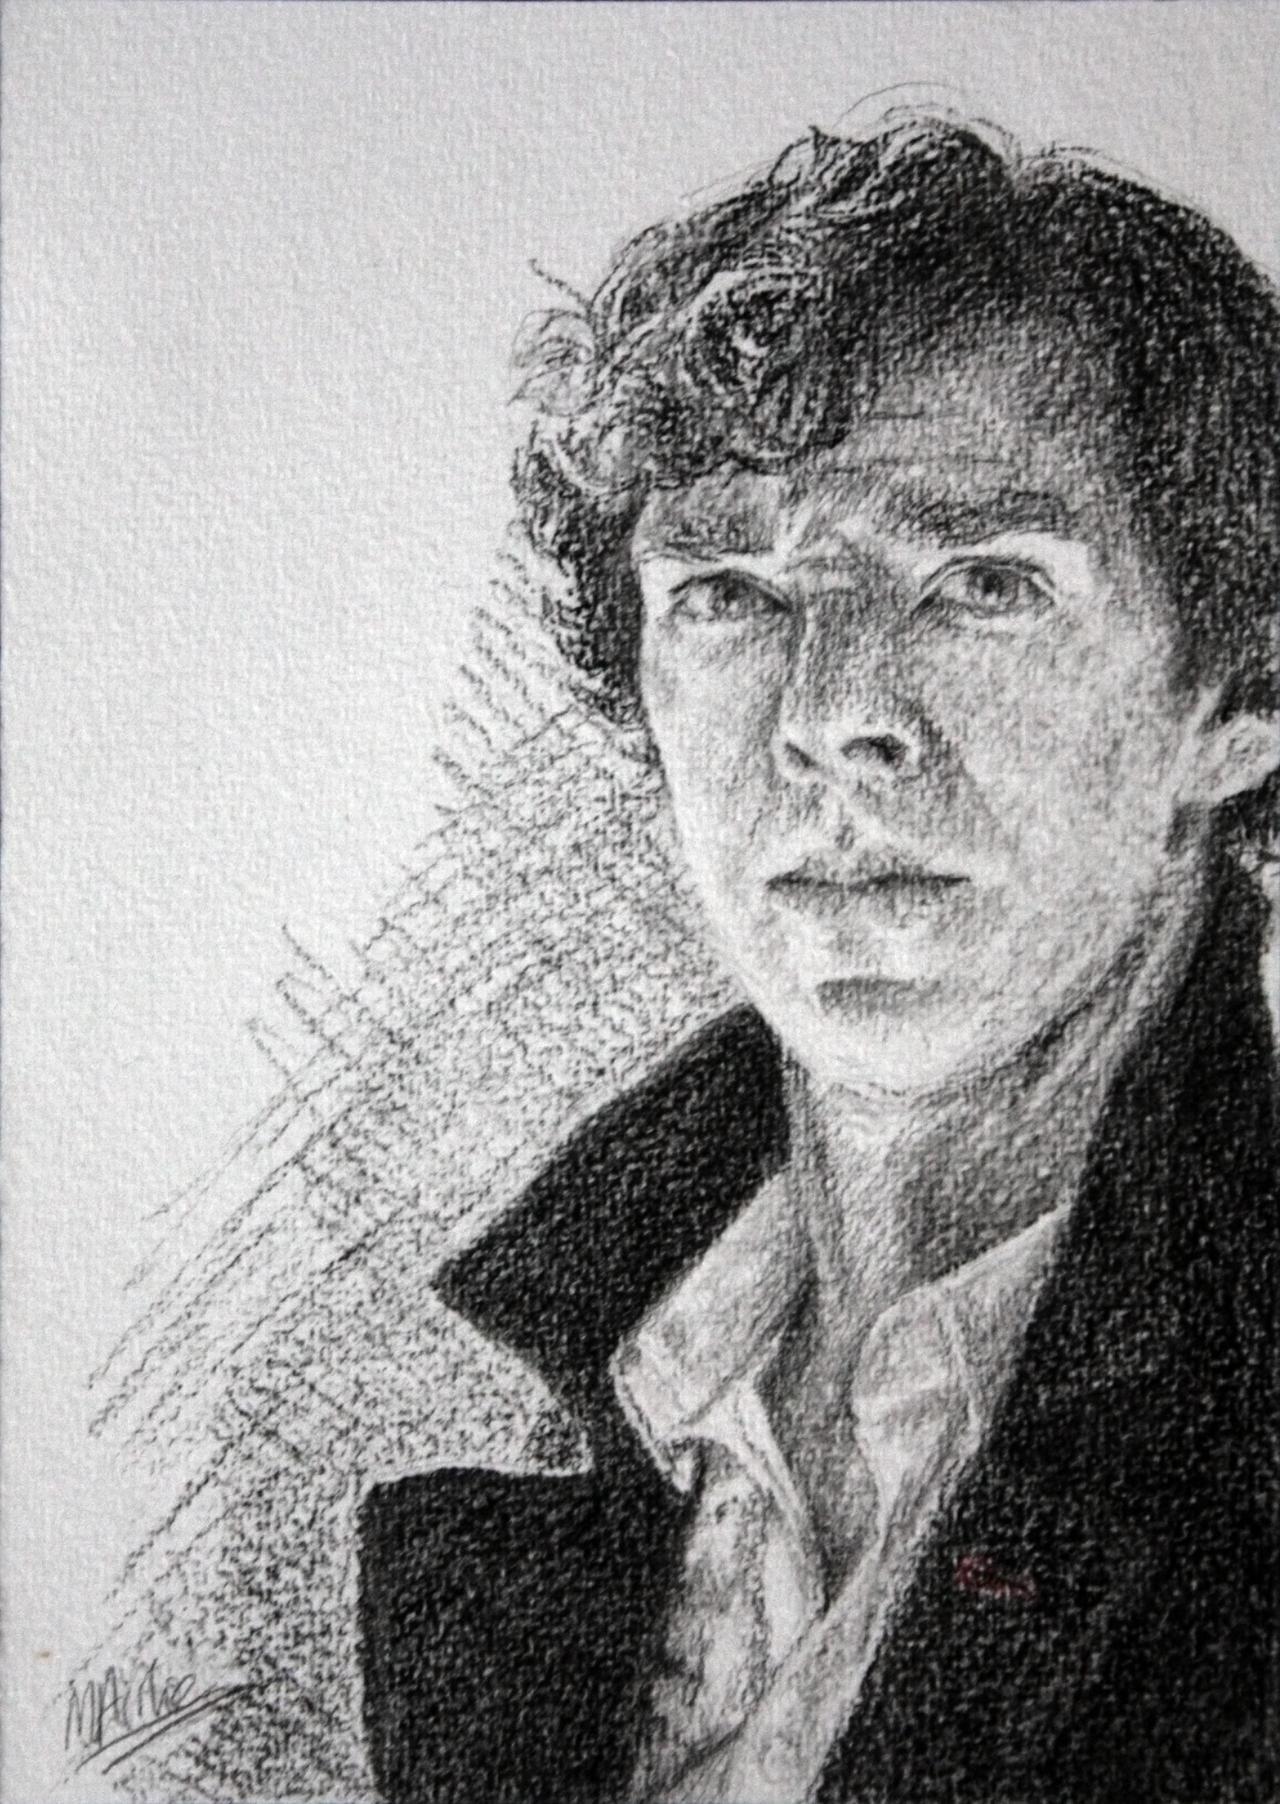 Charcoal Sherlock by Atarial